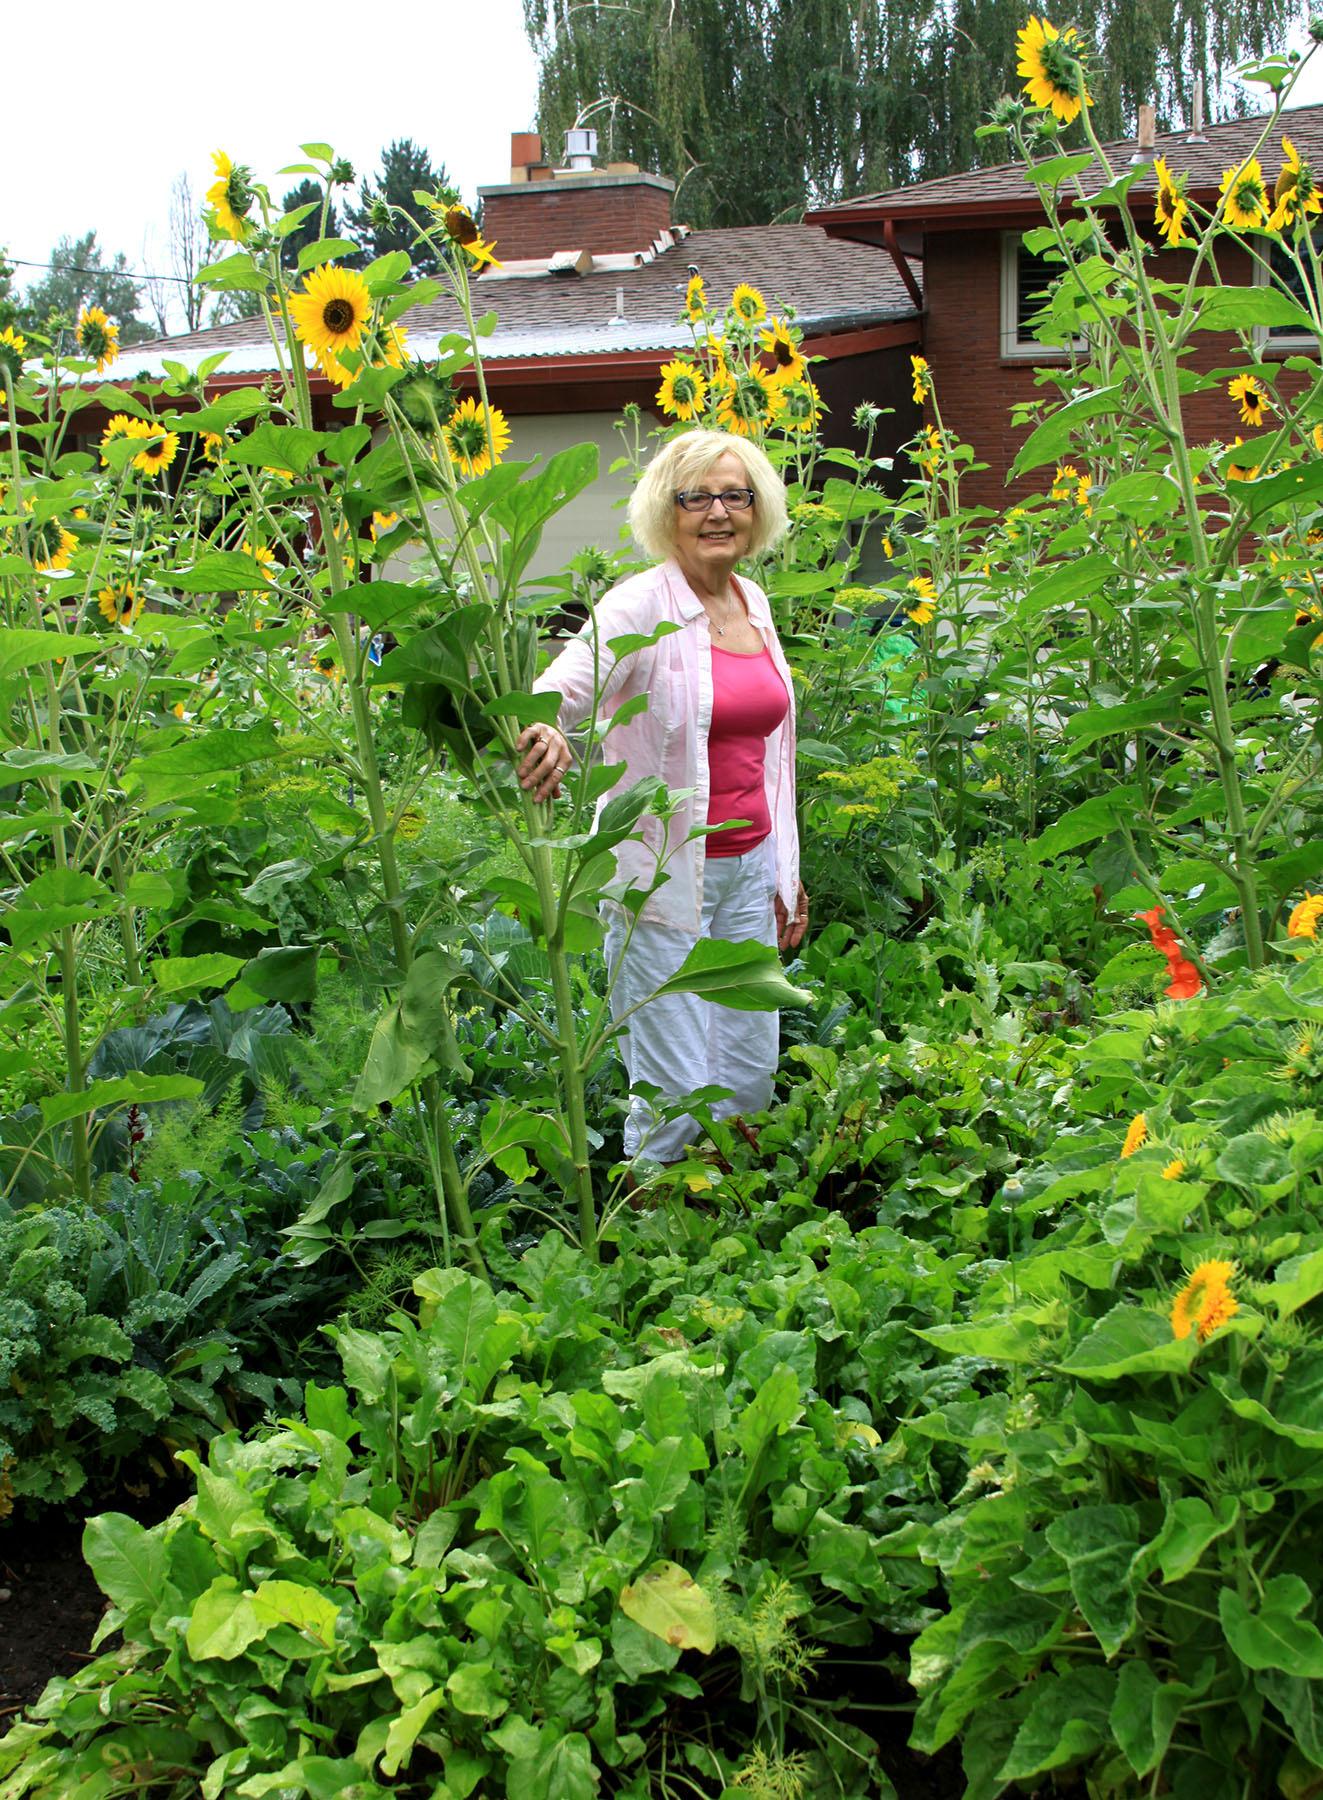 in the garden lasagna gardening yields big harvest the spokesman review. Black Bedroom Furniture Sets. Home Design Ideas